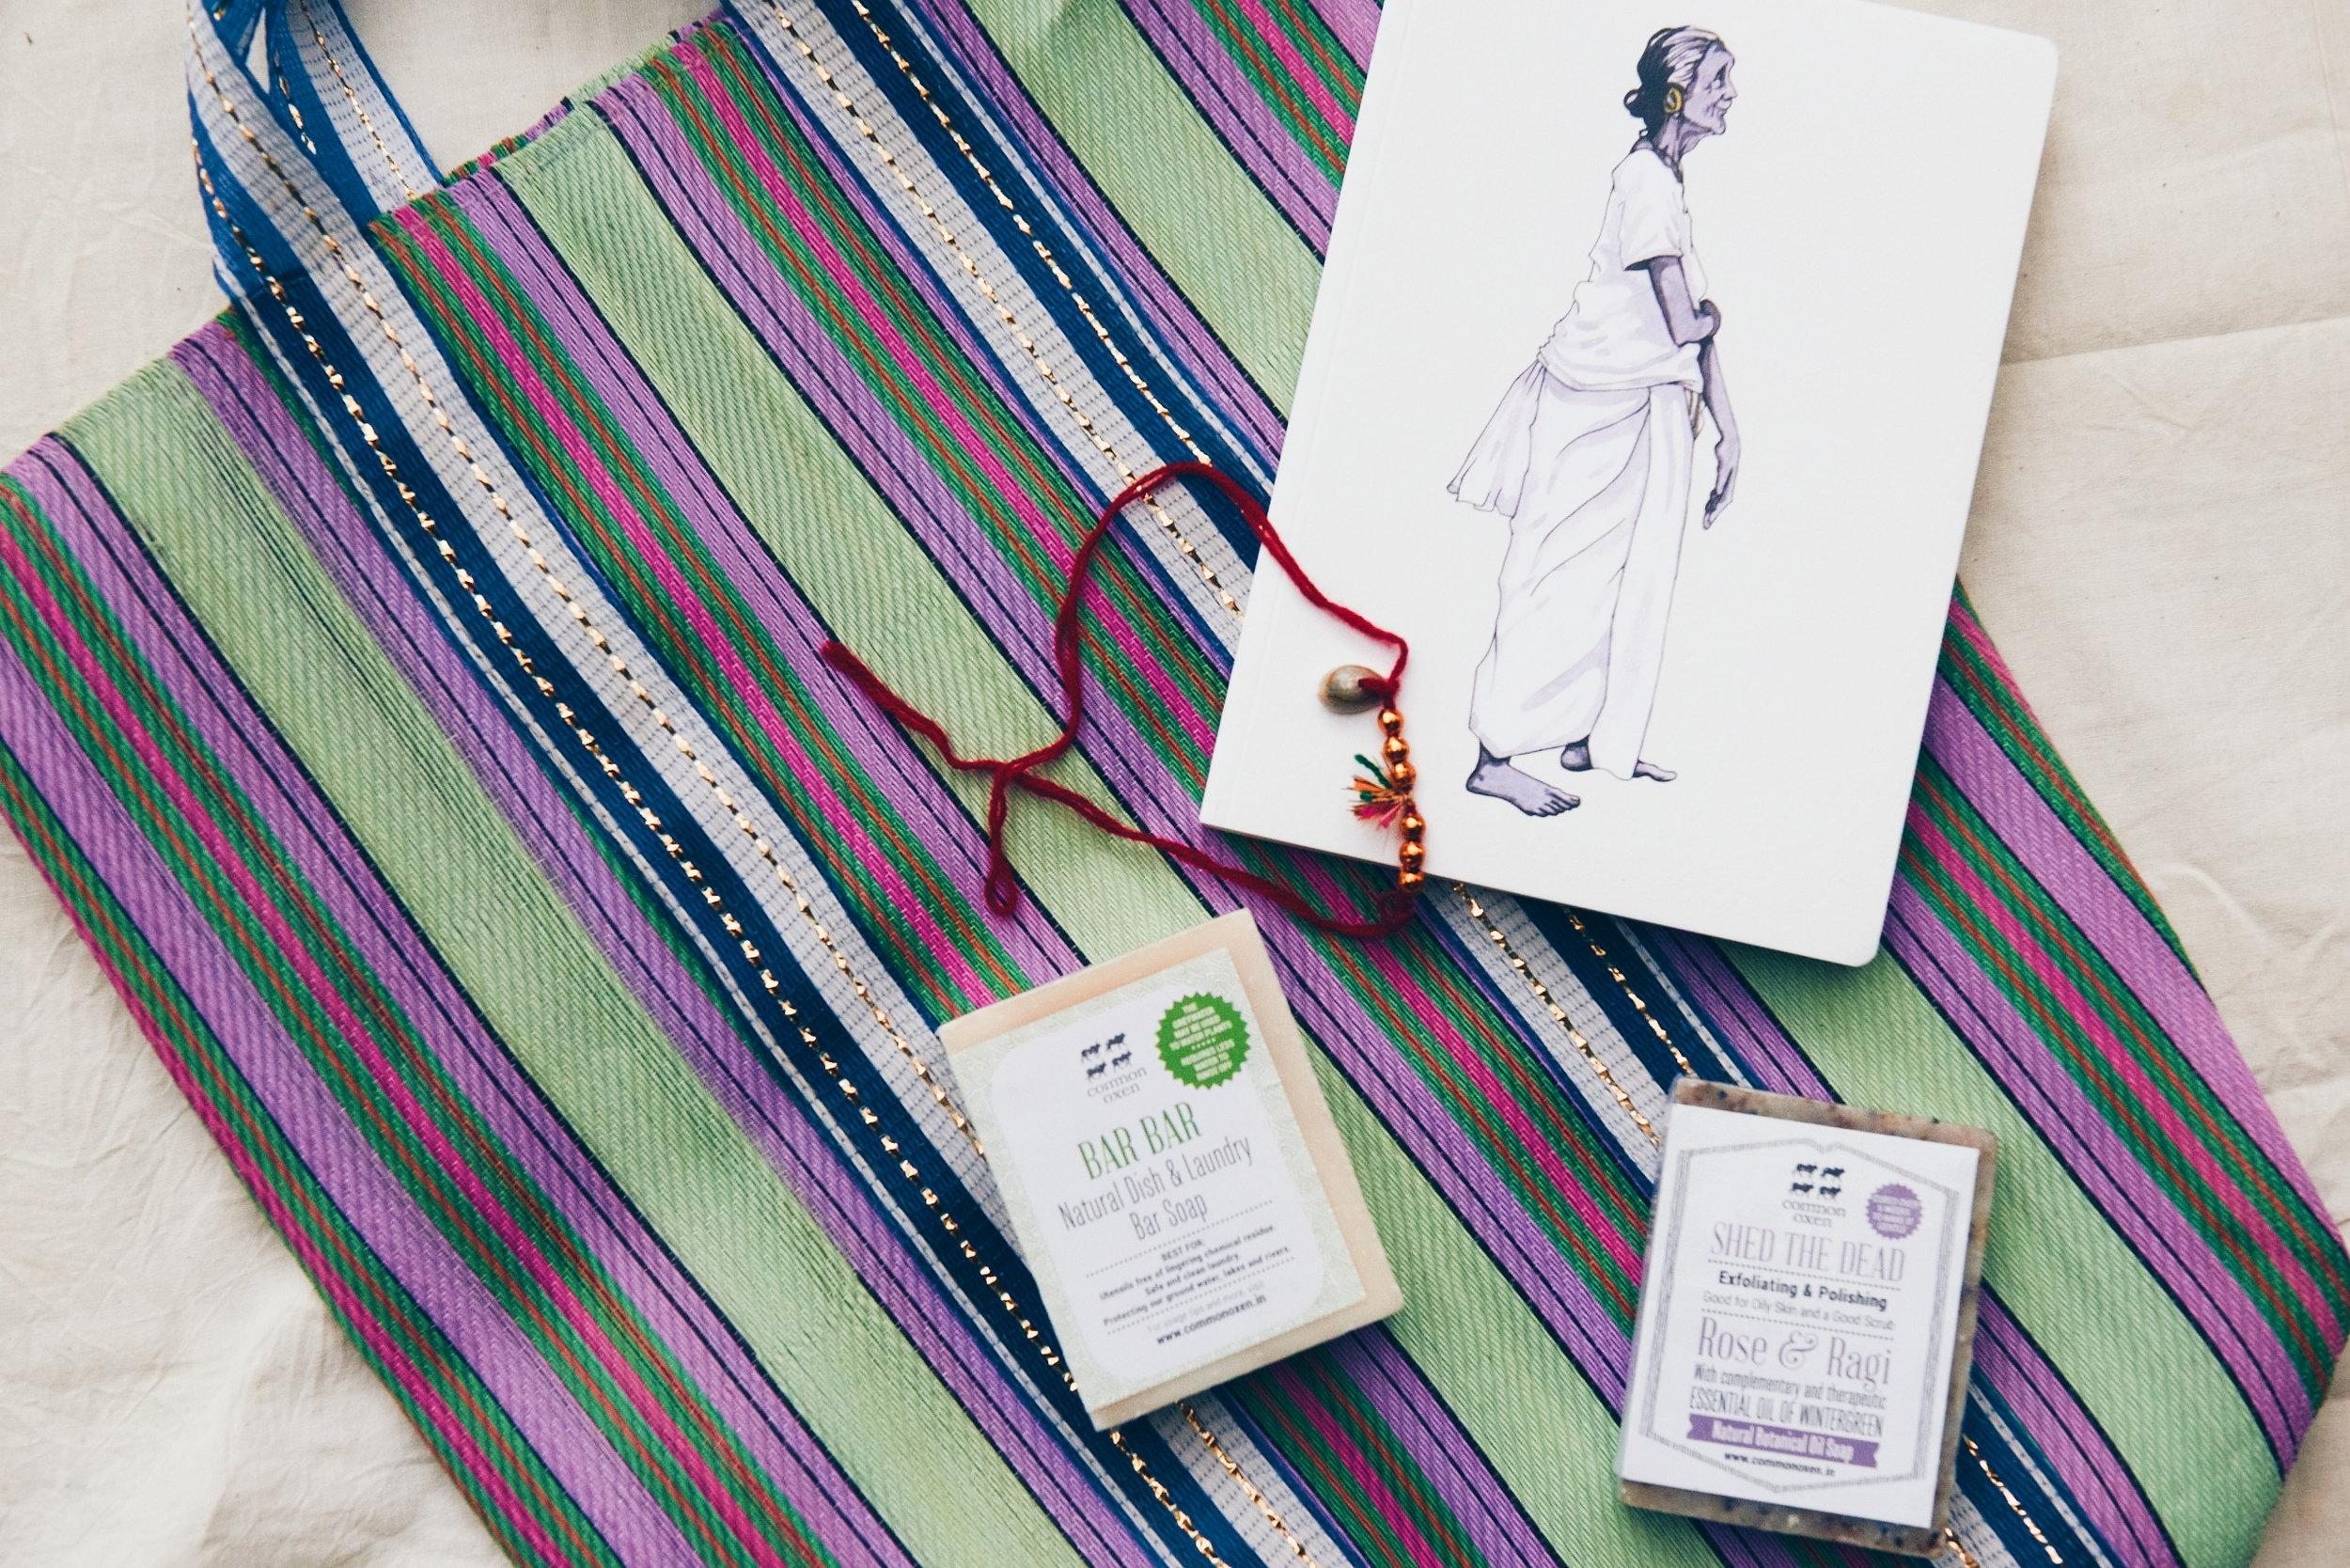 An Indian tote, soaps, Kalonji seeds, a notebook, Rakhi bracelet, and recipes